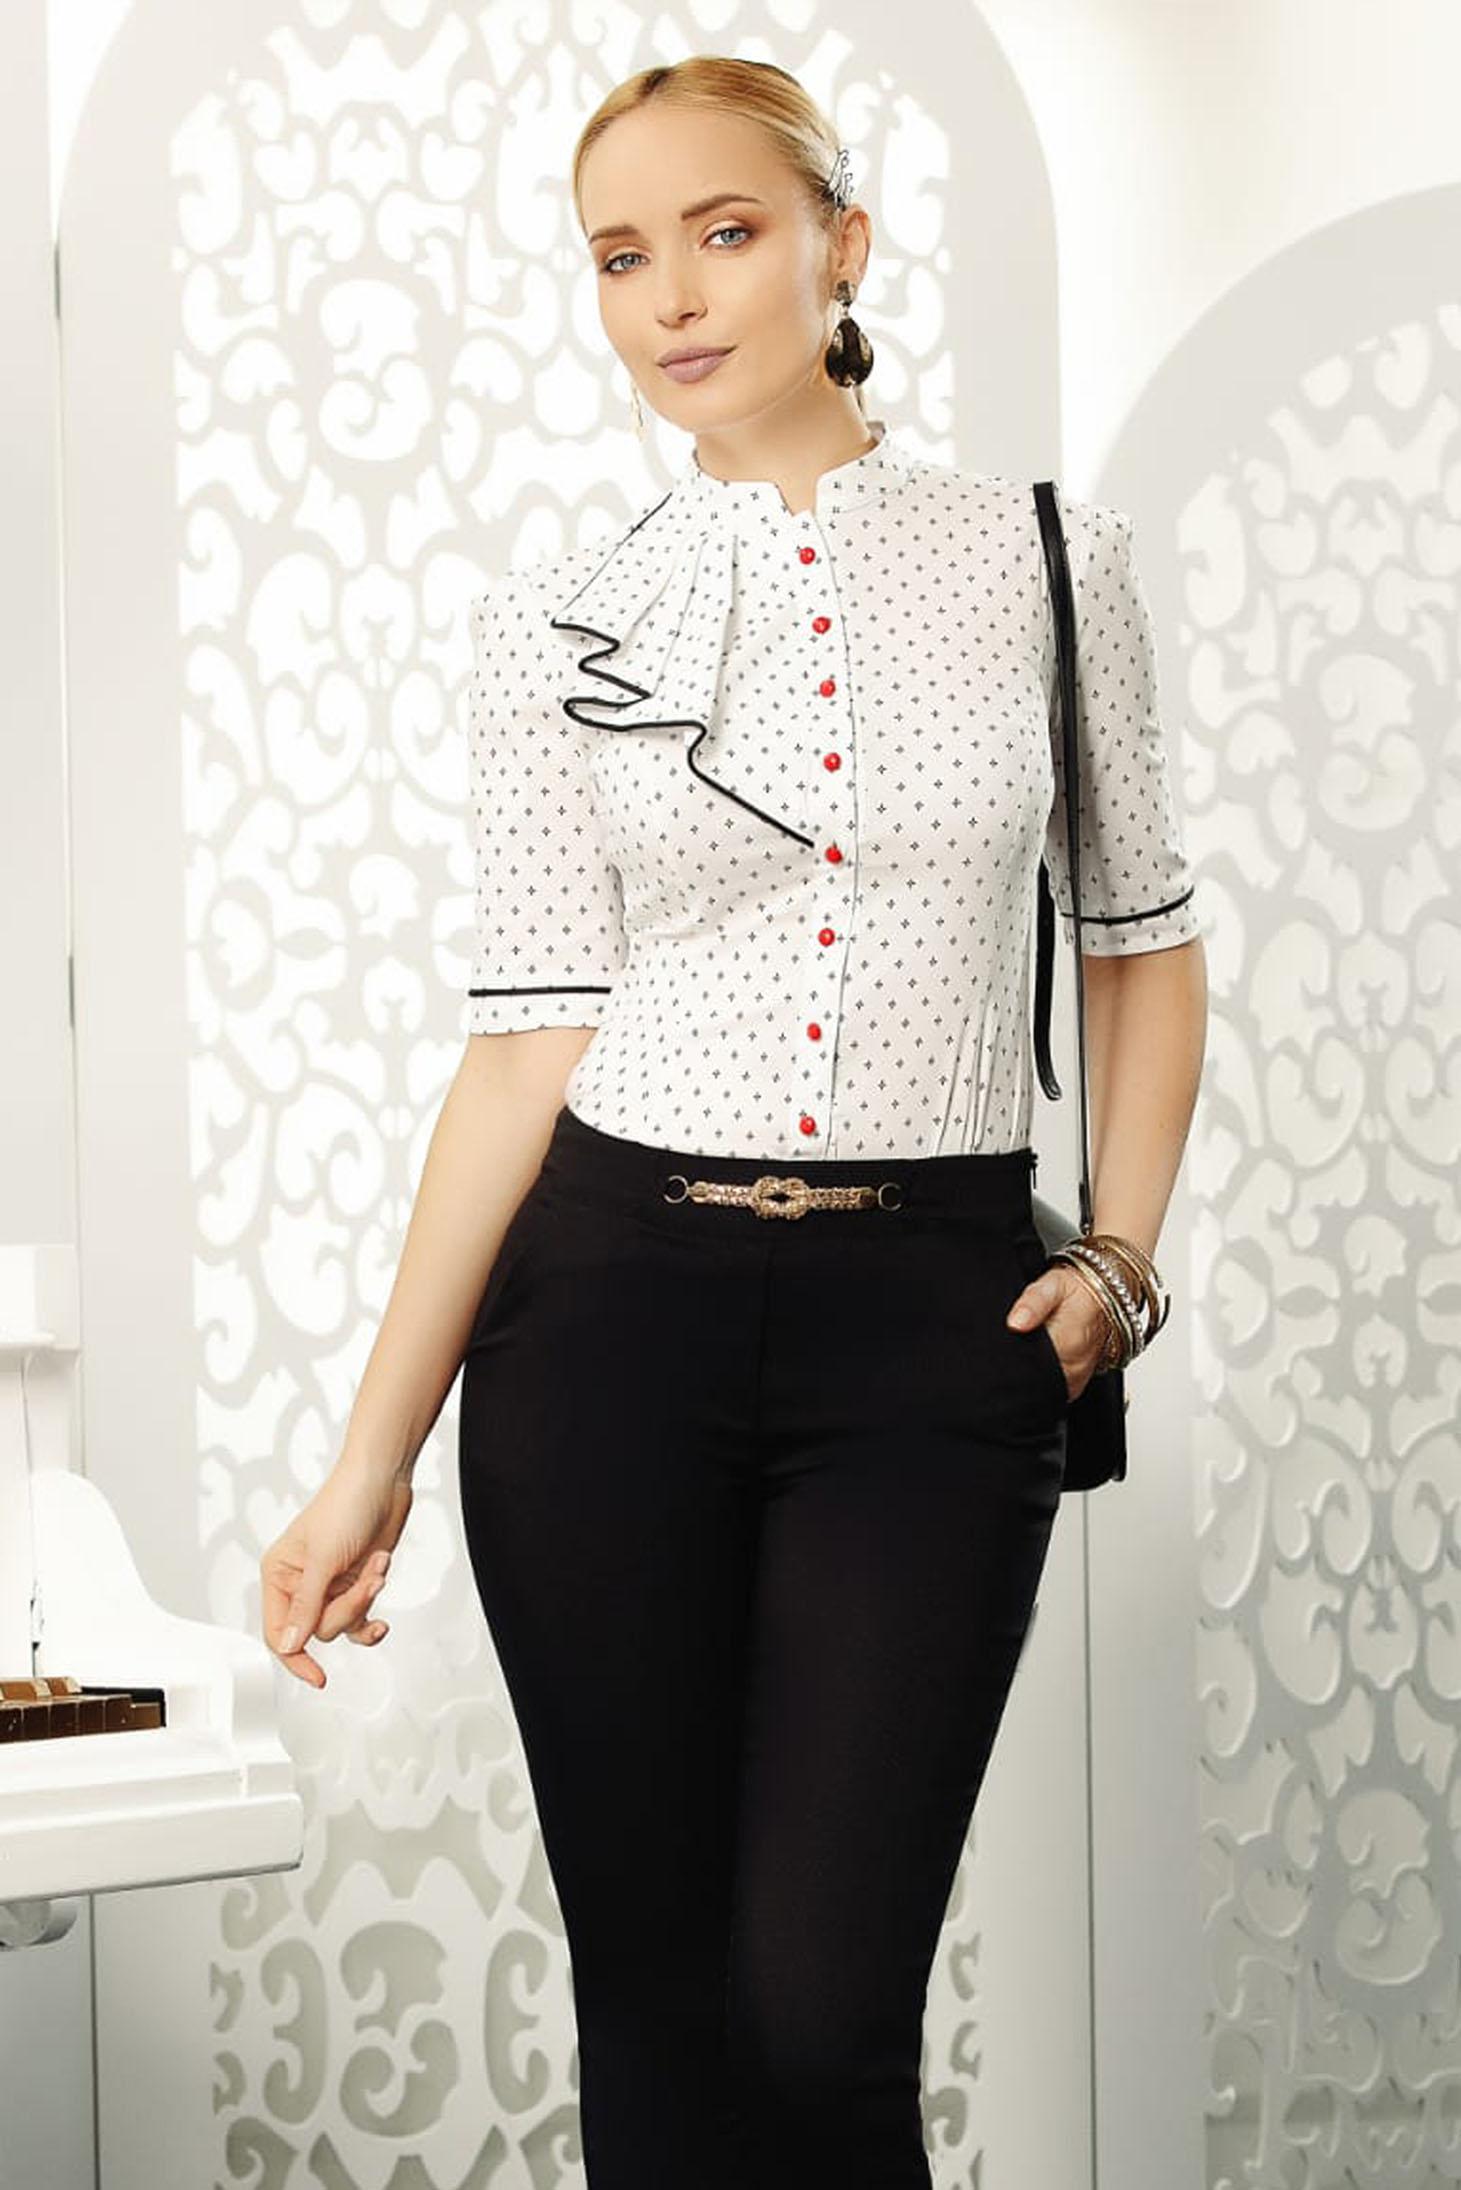 Fofy white elegant women`s shirt short sleeve arched cut slightly elastic cotton